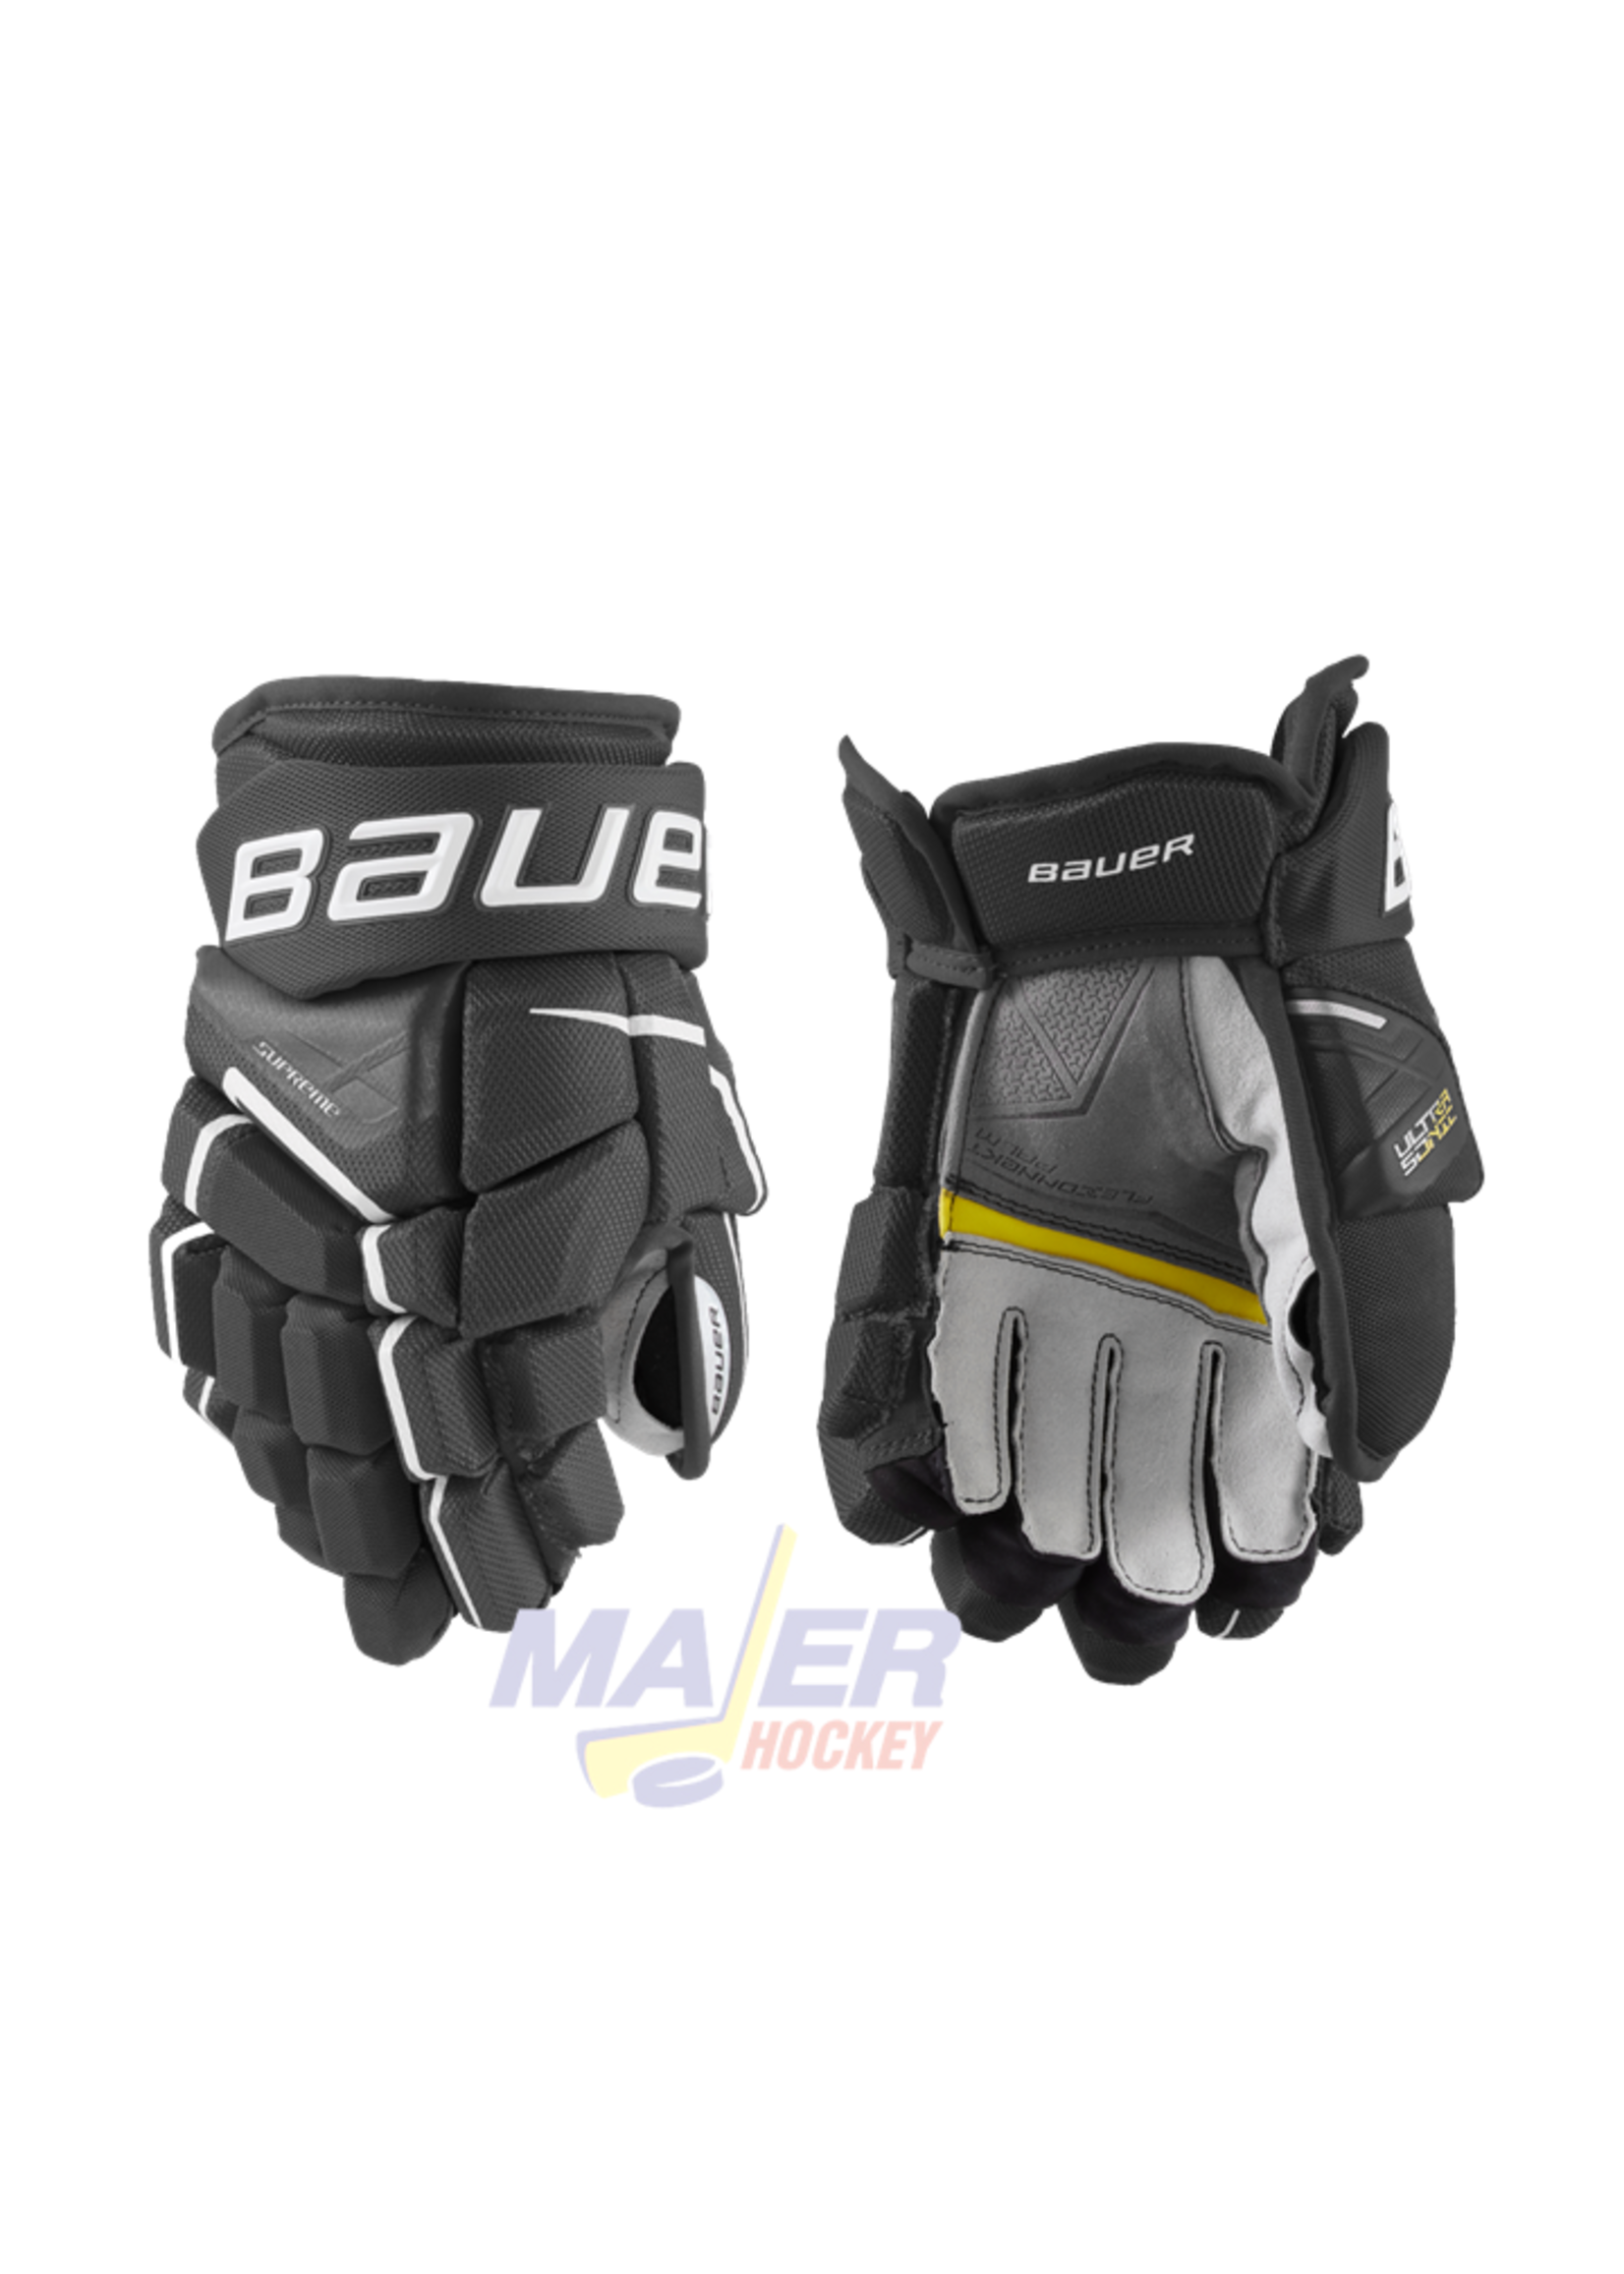 Bauer Supreme Ultrasonic Int Gloves